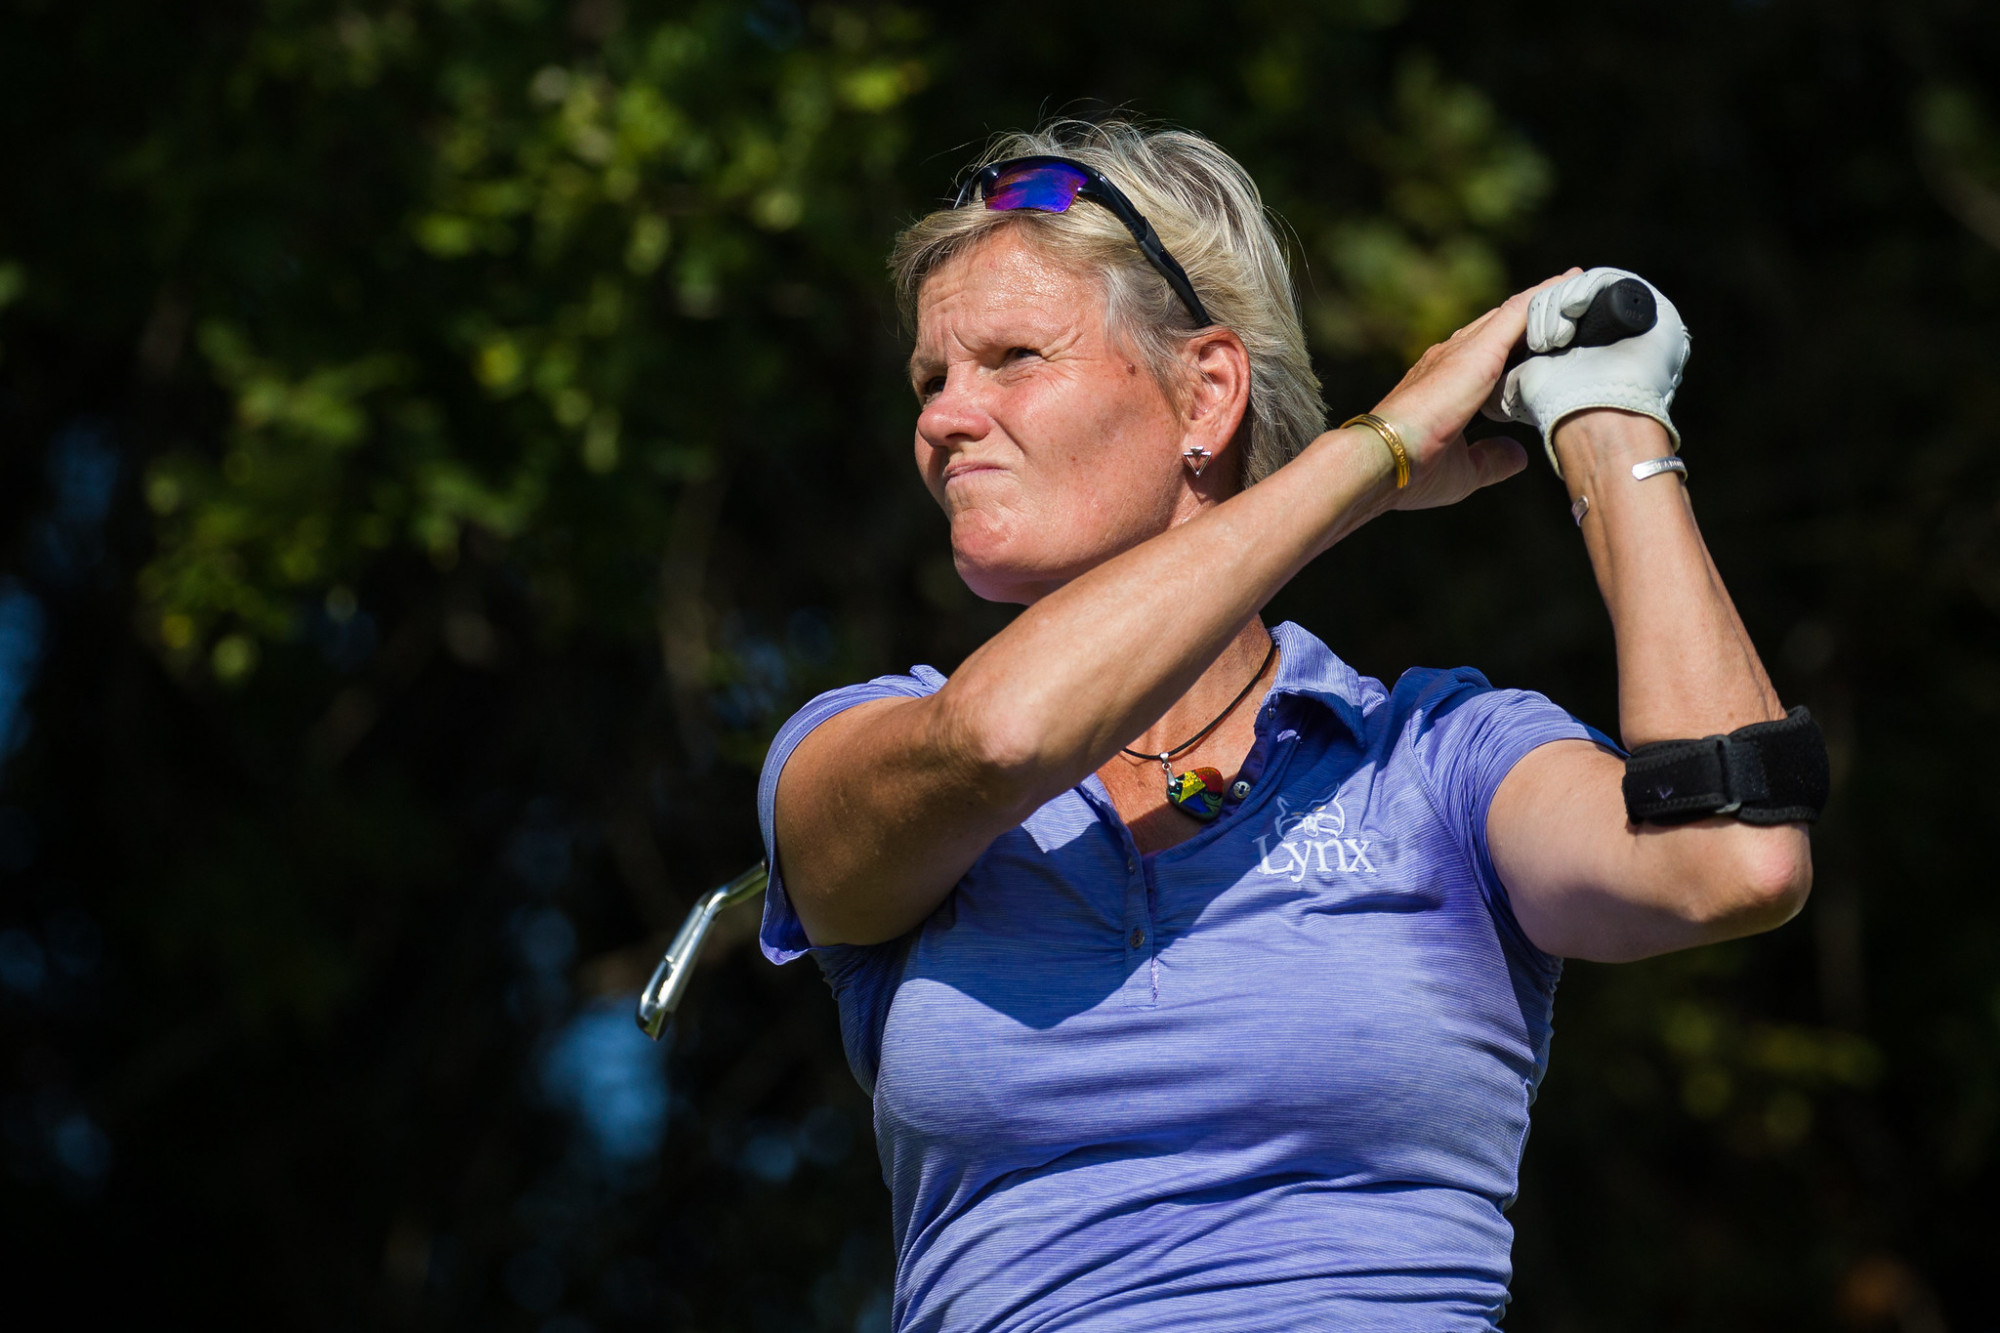 HELEN ALFREDSSON EARNS 2019 SENIOR SLAM AT FRENCH LICK RESORT - Ladies European Tour